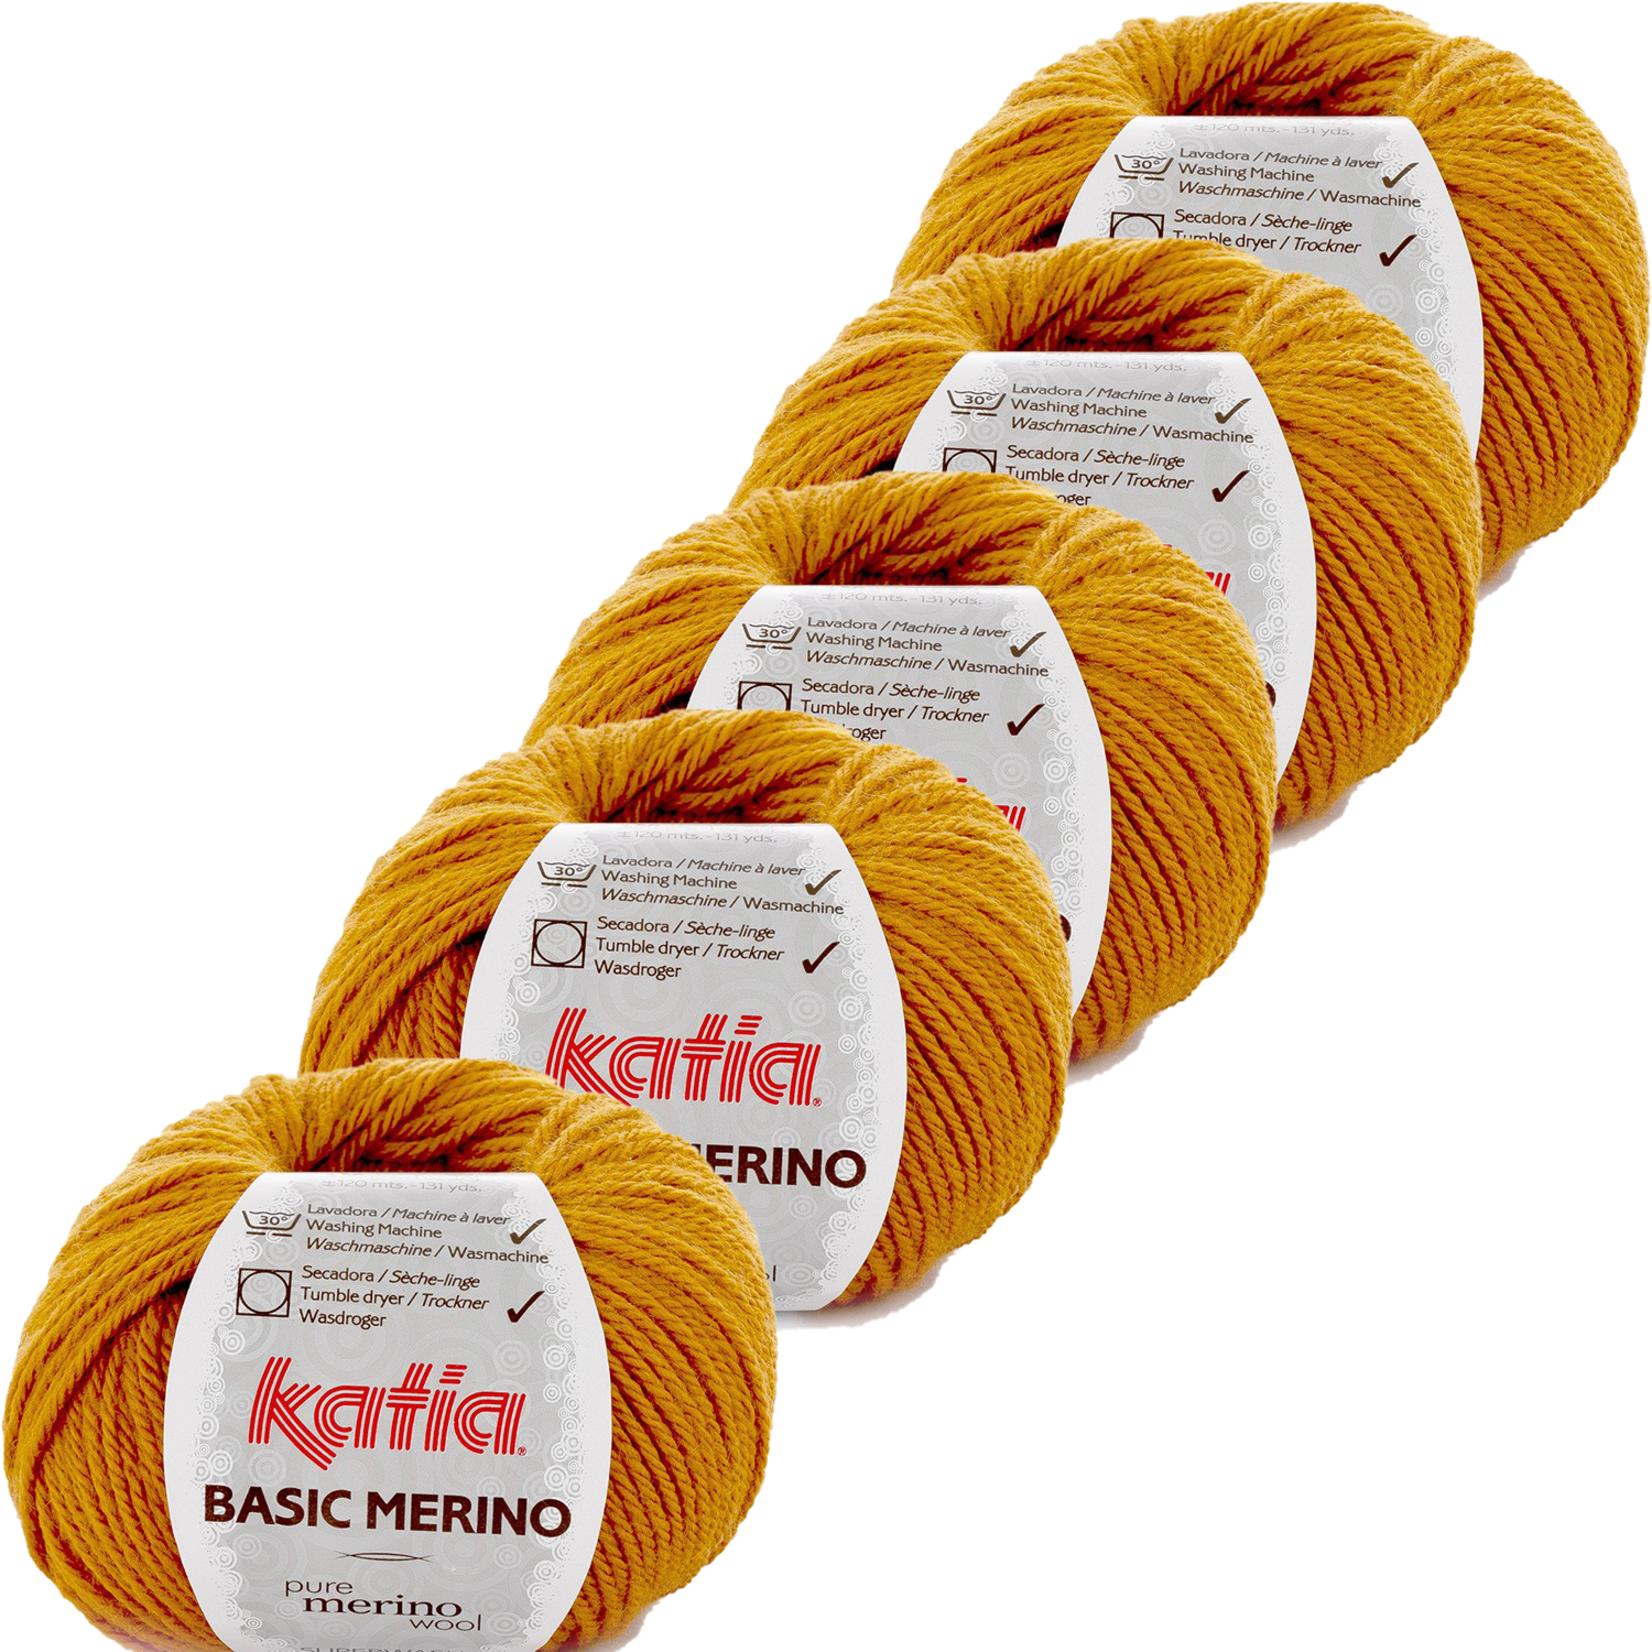 Katia Basic Merino - kleur 71_Oker - bundel 5 bollen 50 gr.  van 120 m.